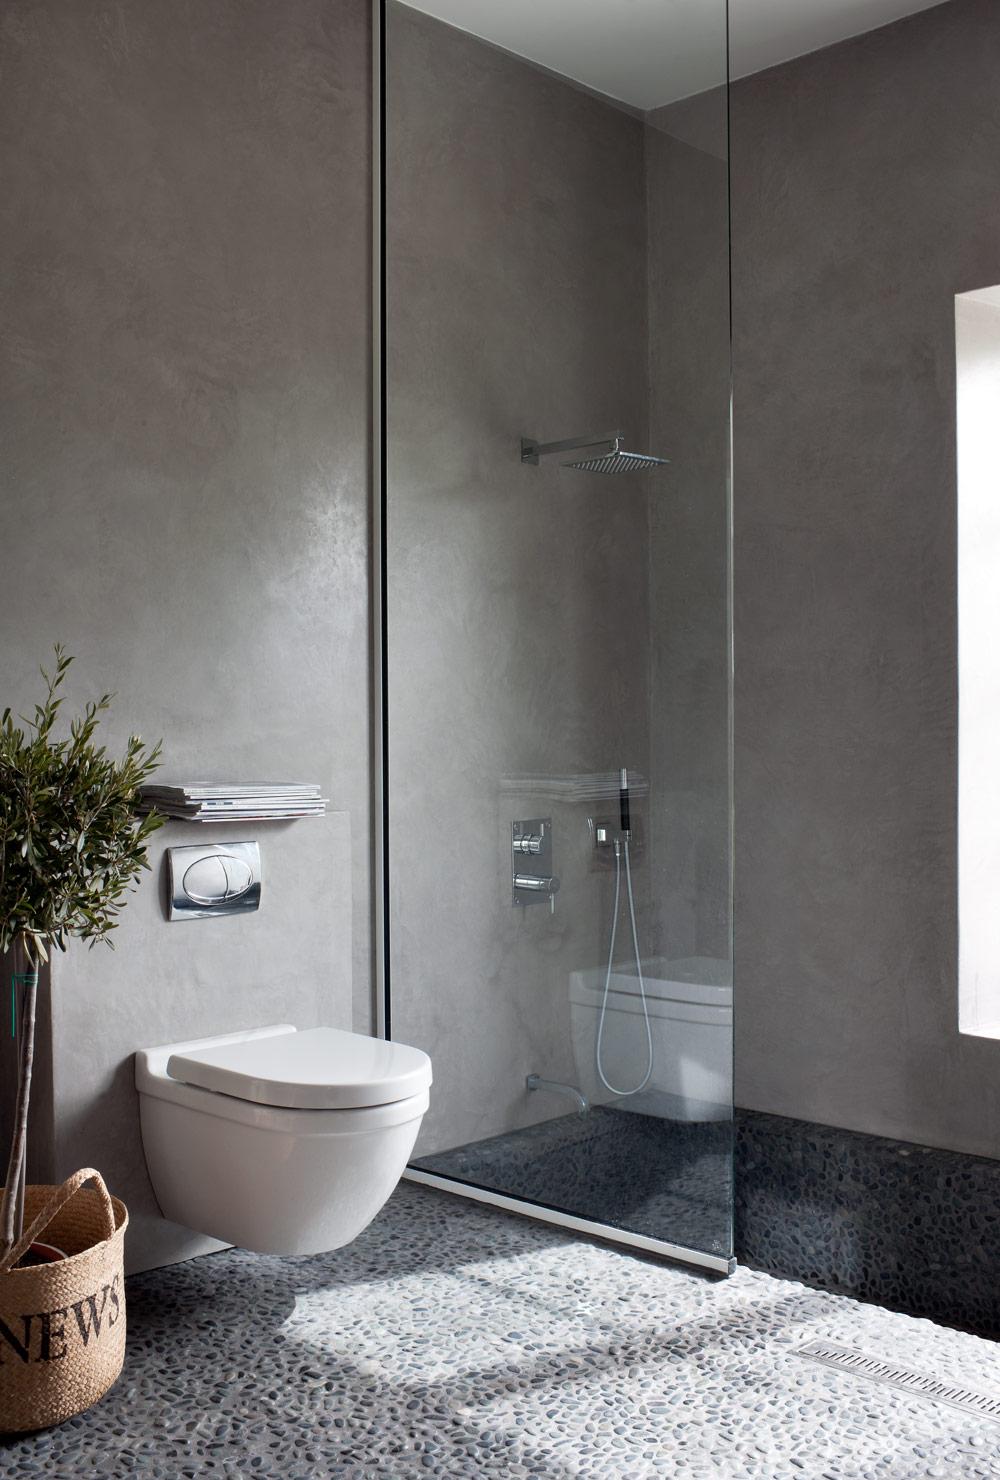 Vackra badrumsgolv ~ Xellen.com